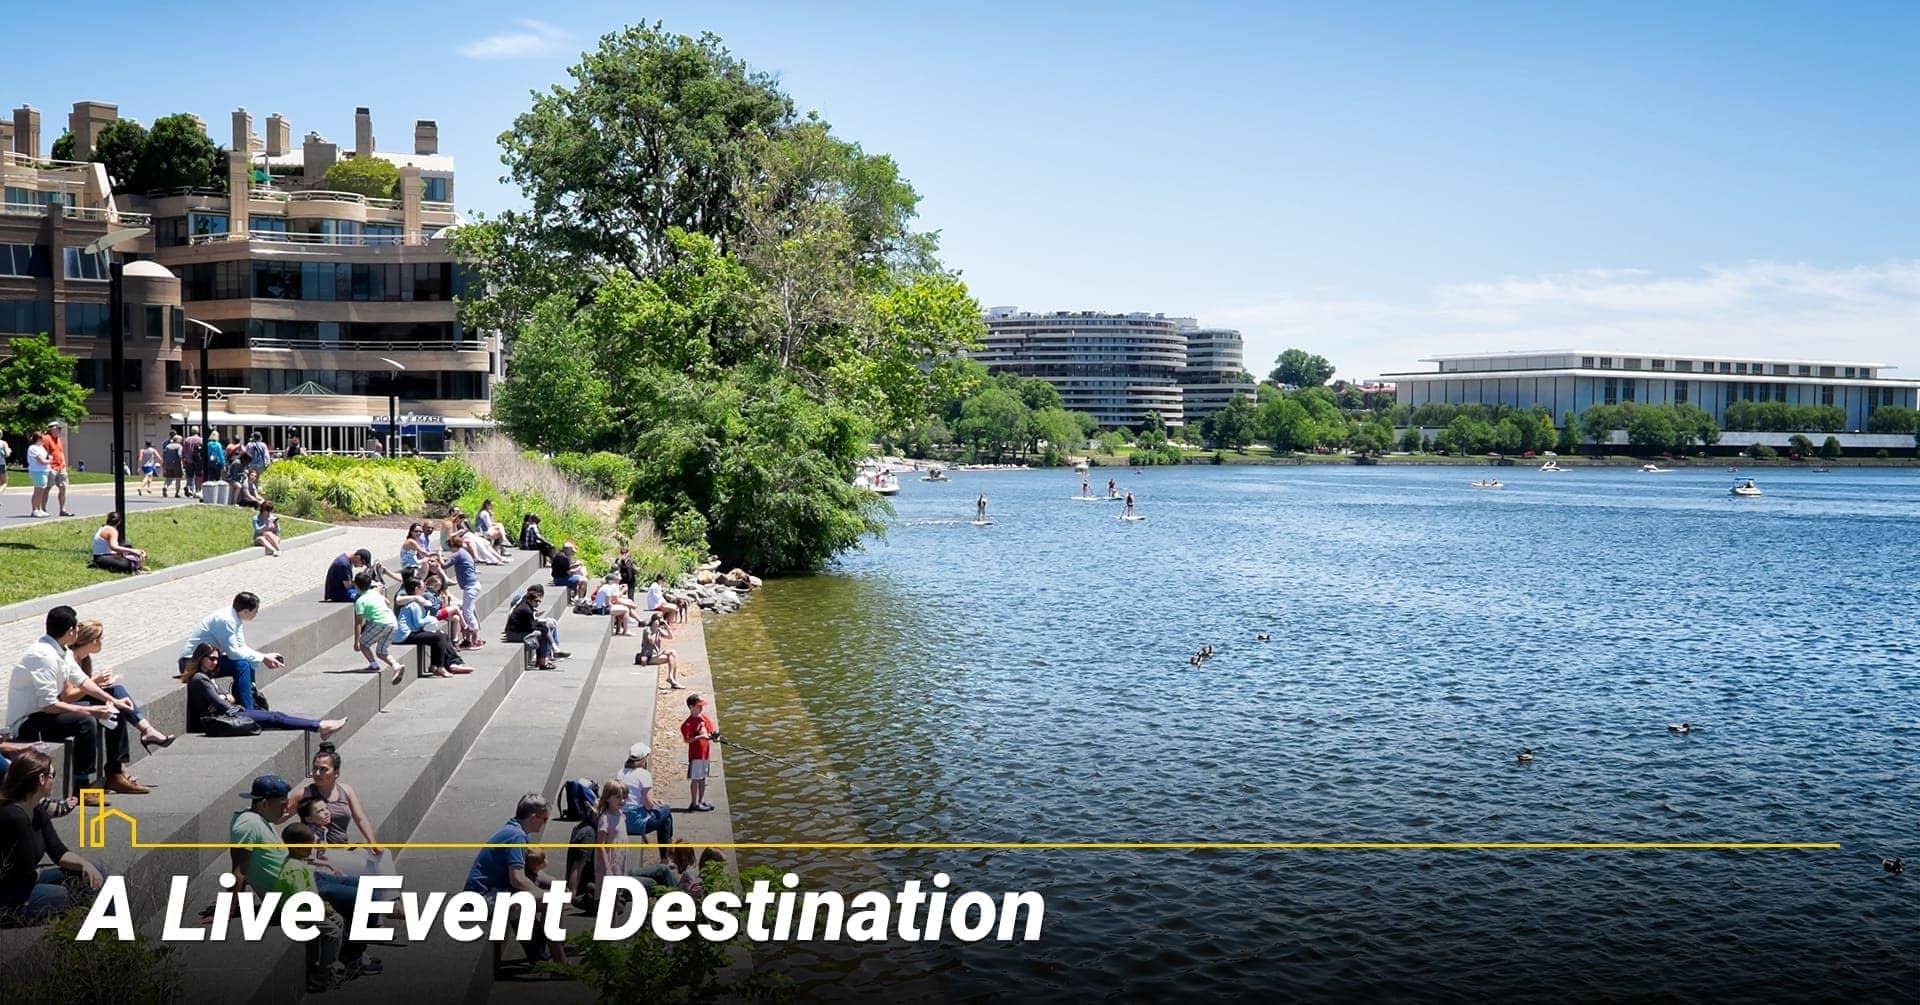 A Live Event Destination in Washington, DC